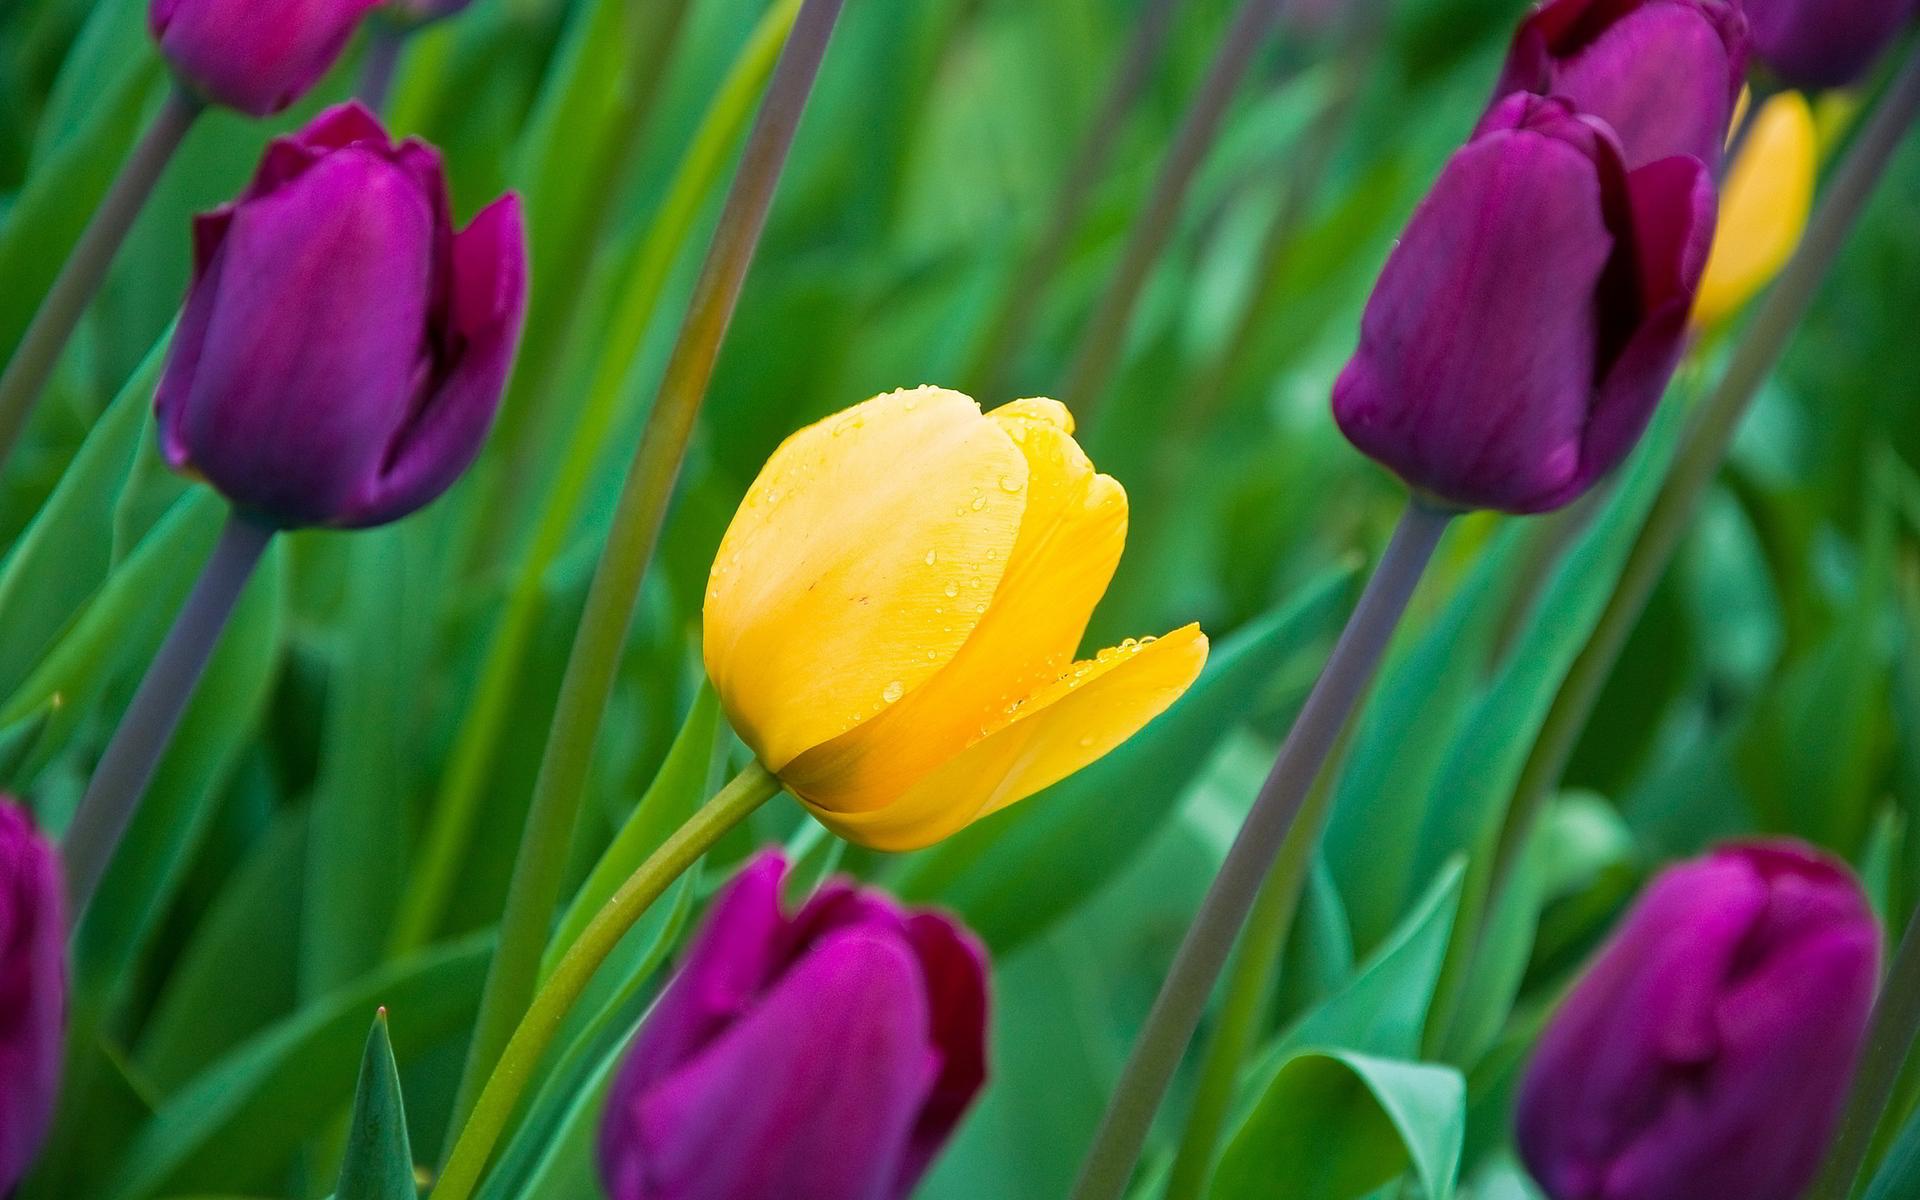 Purple yellow tulips